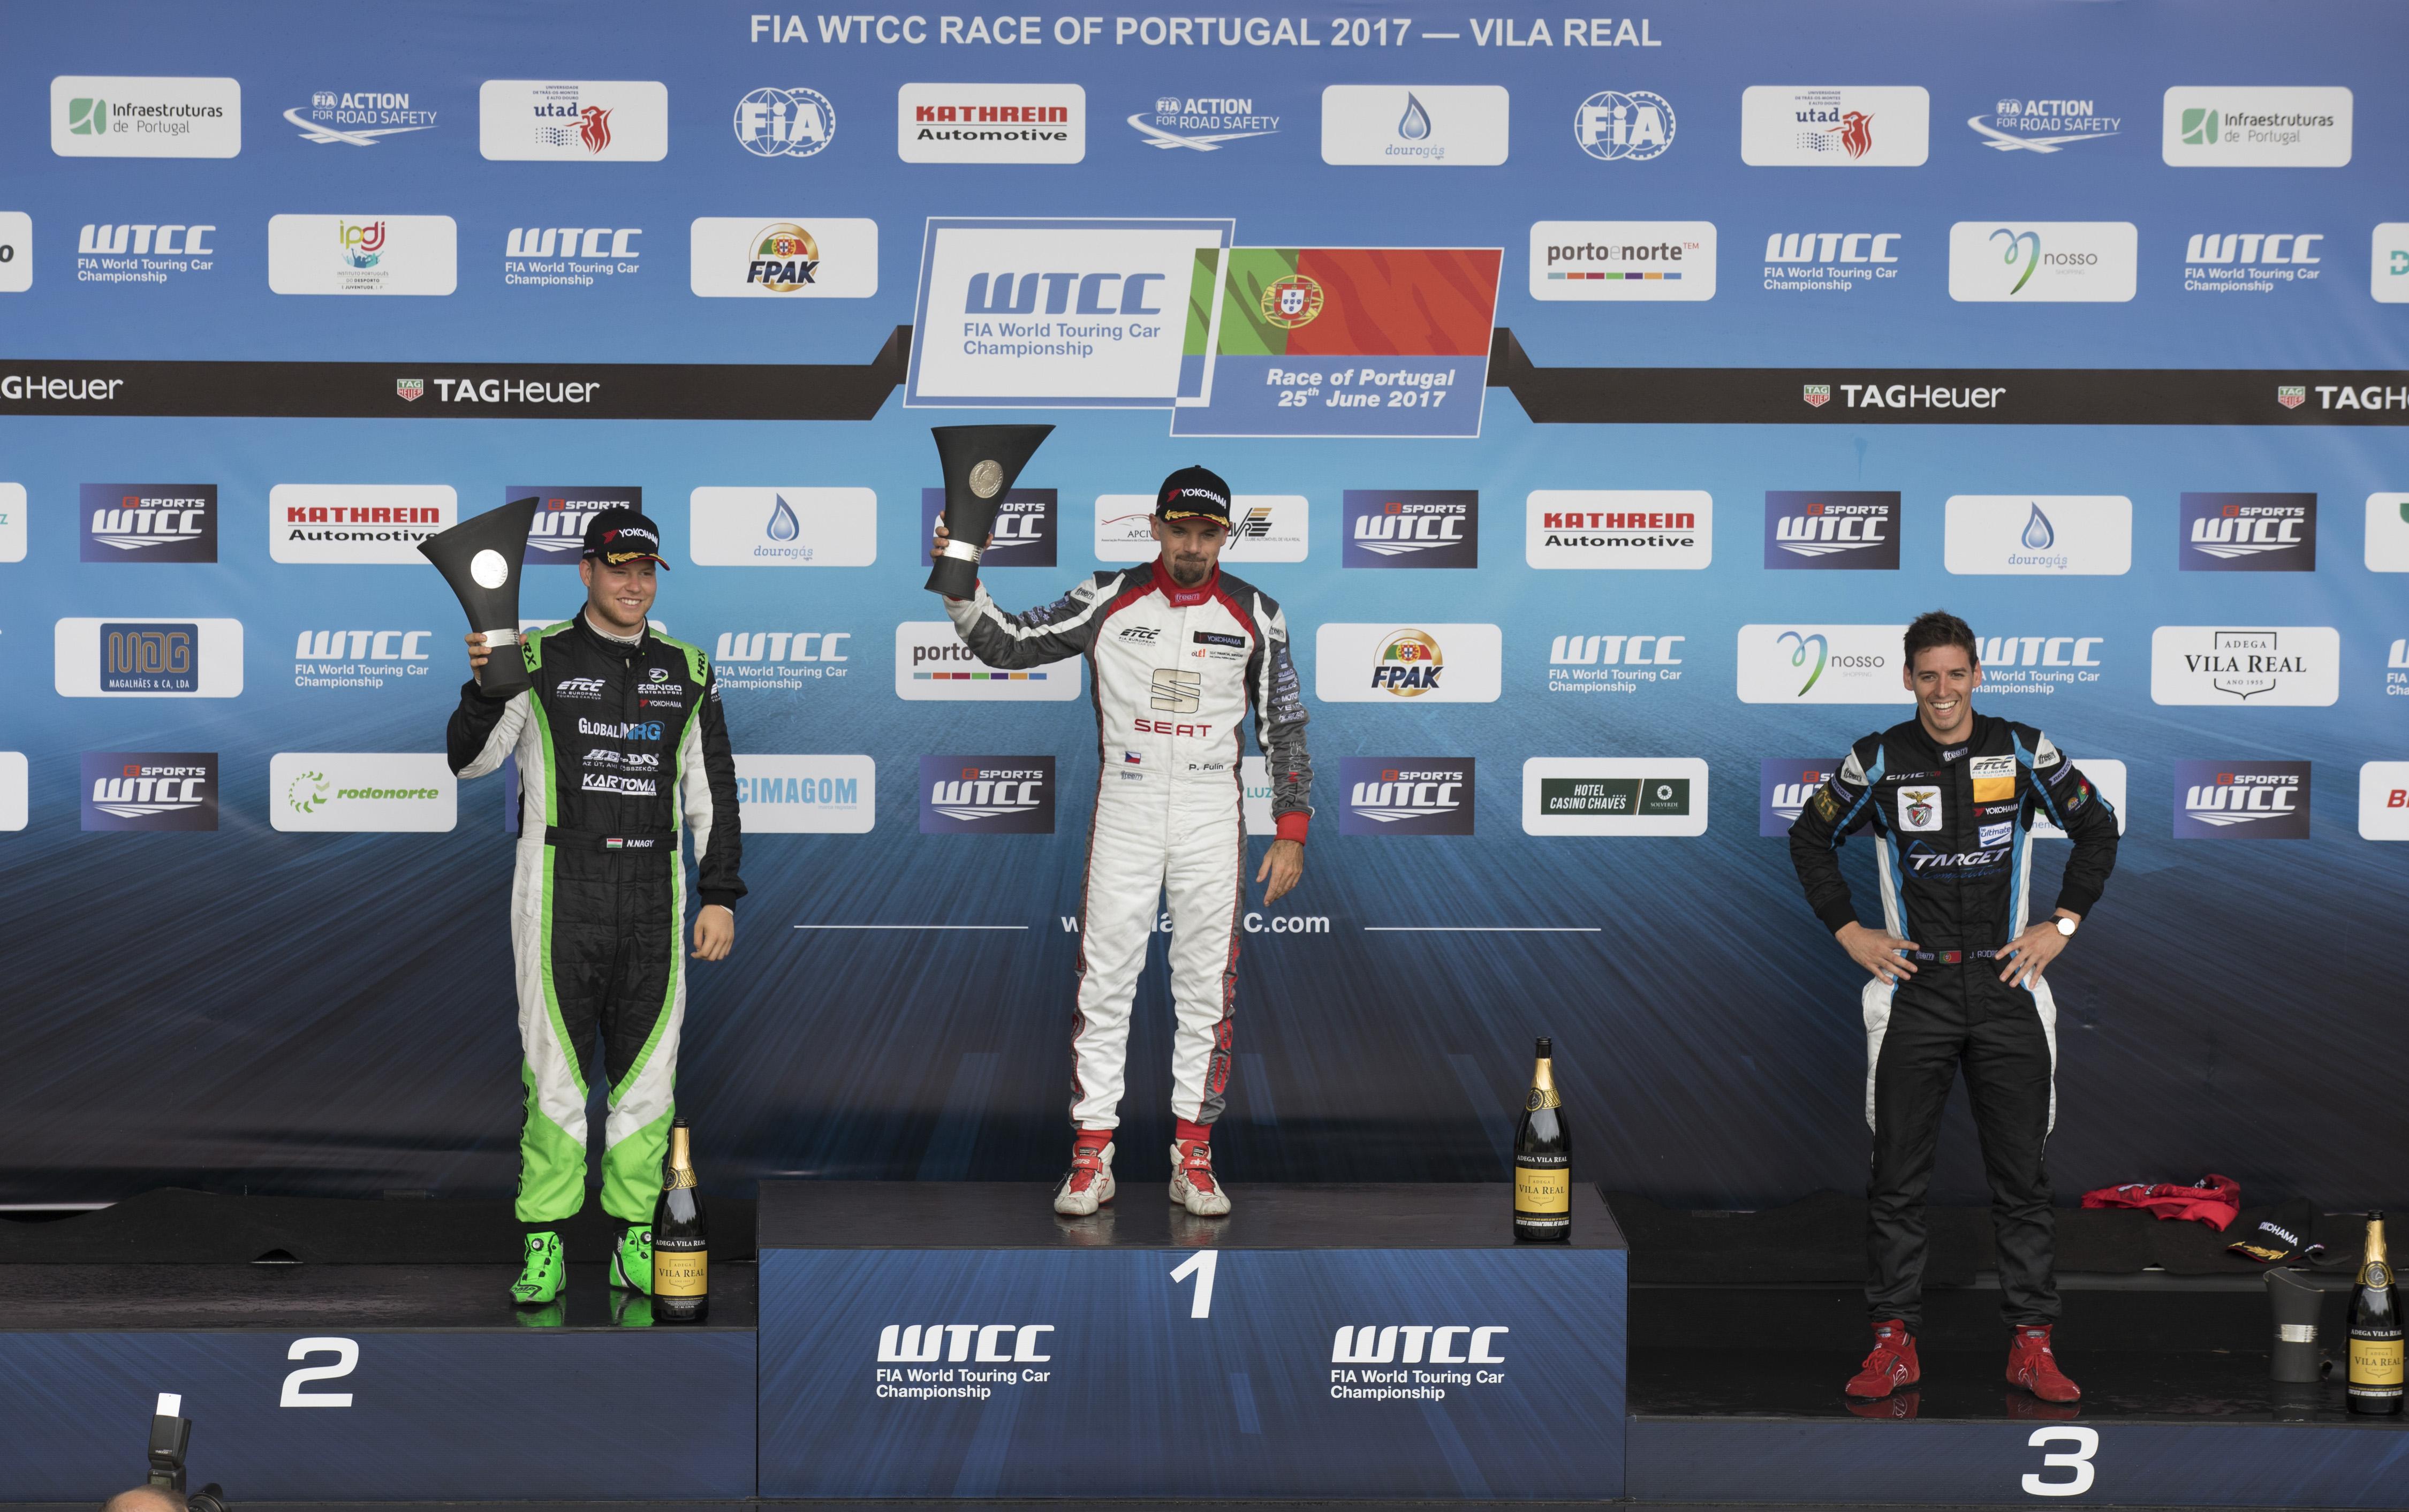 jose_rodrigues_etcc_race_of_vila_real_podium_2017-jpg.jpg